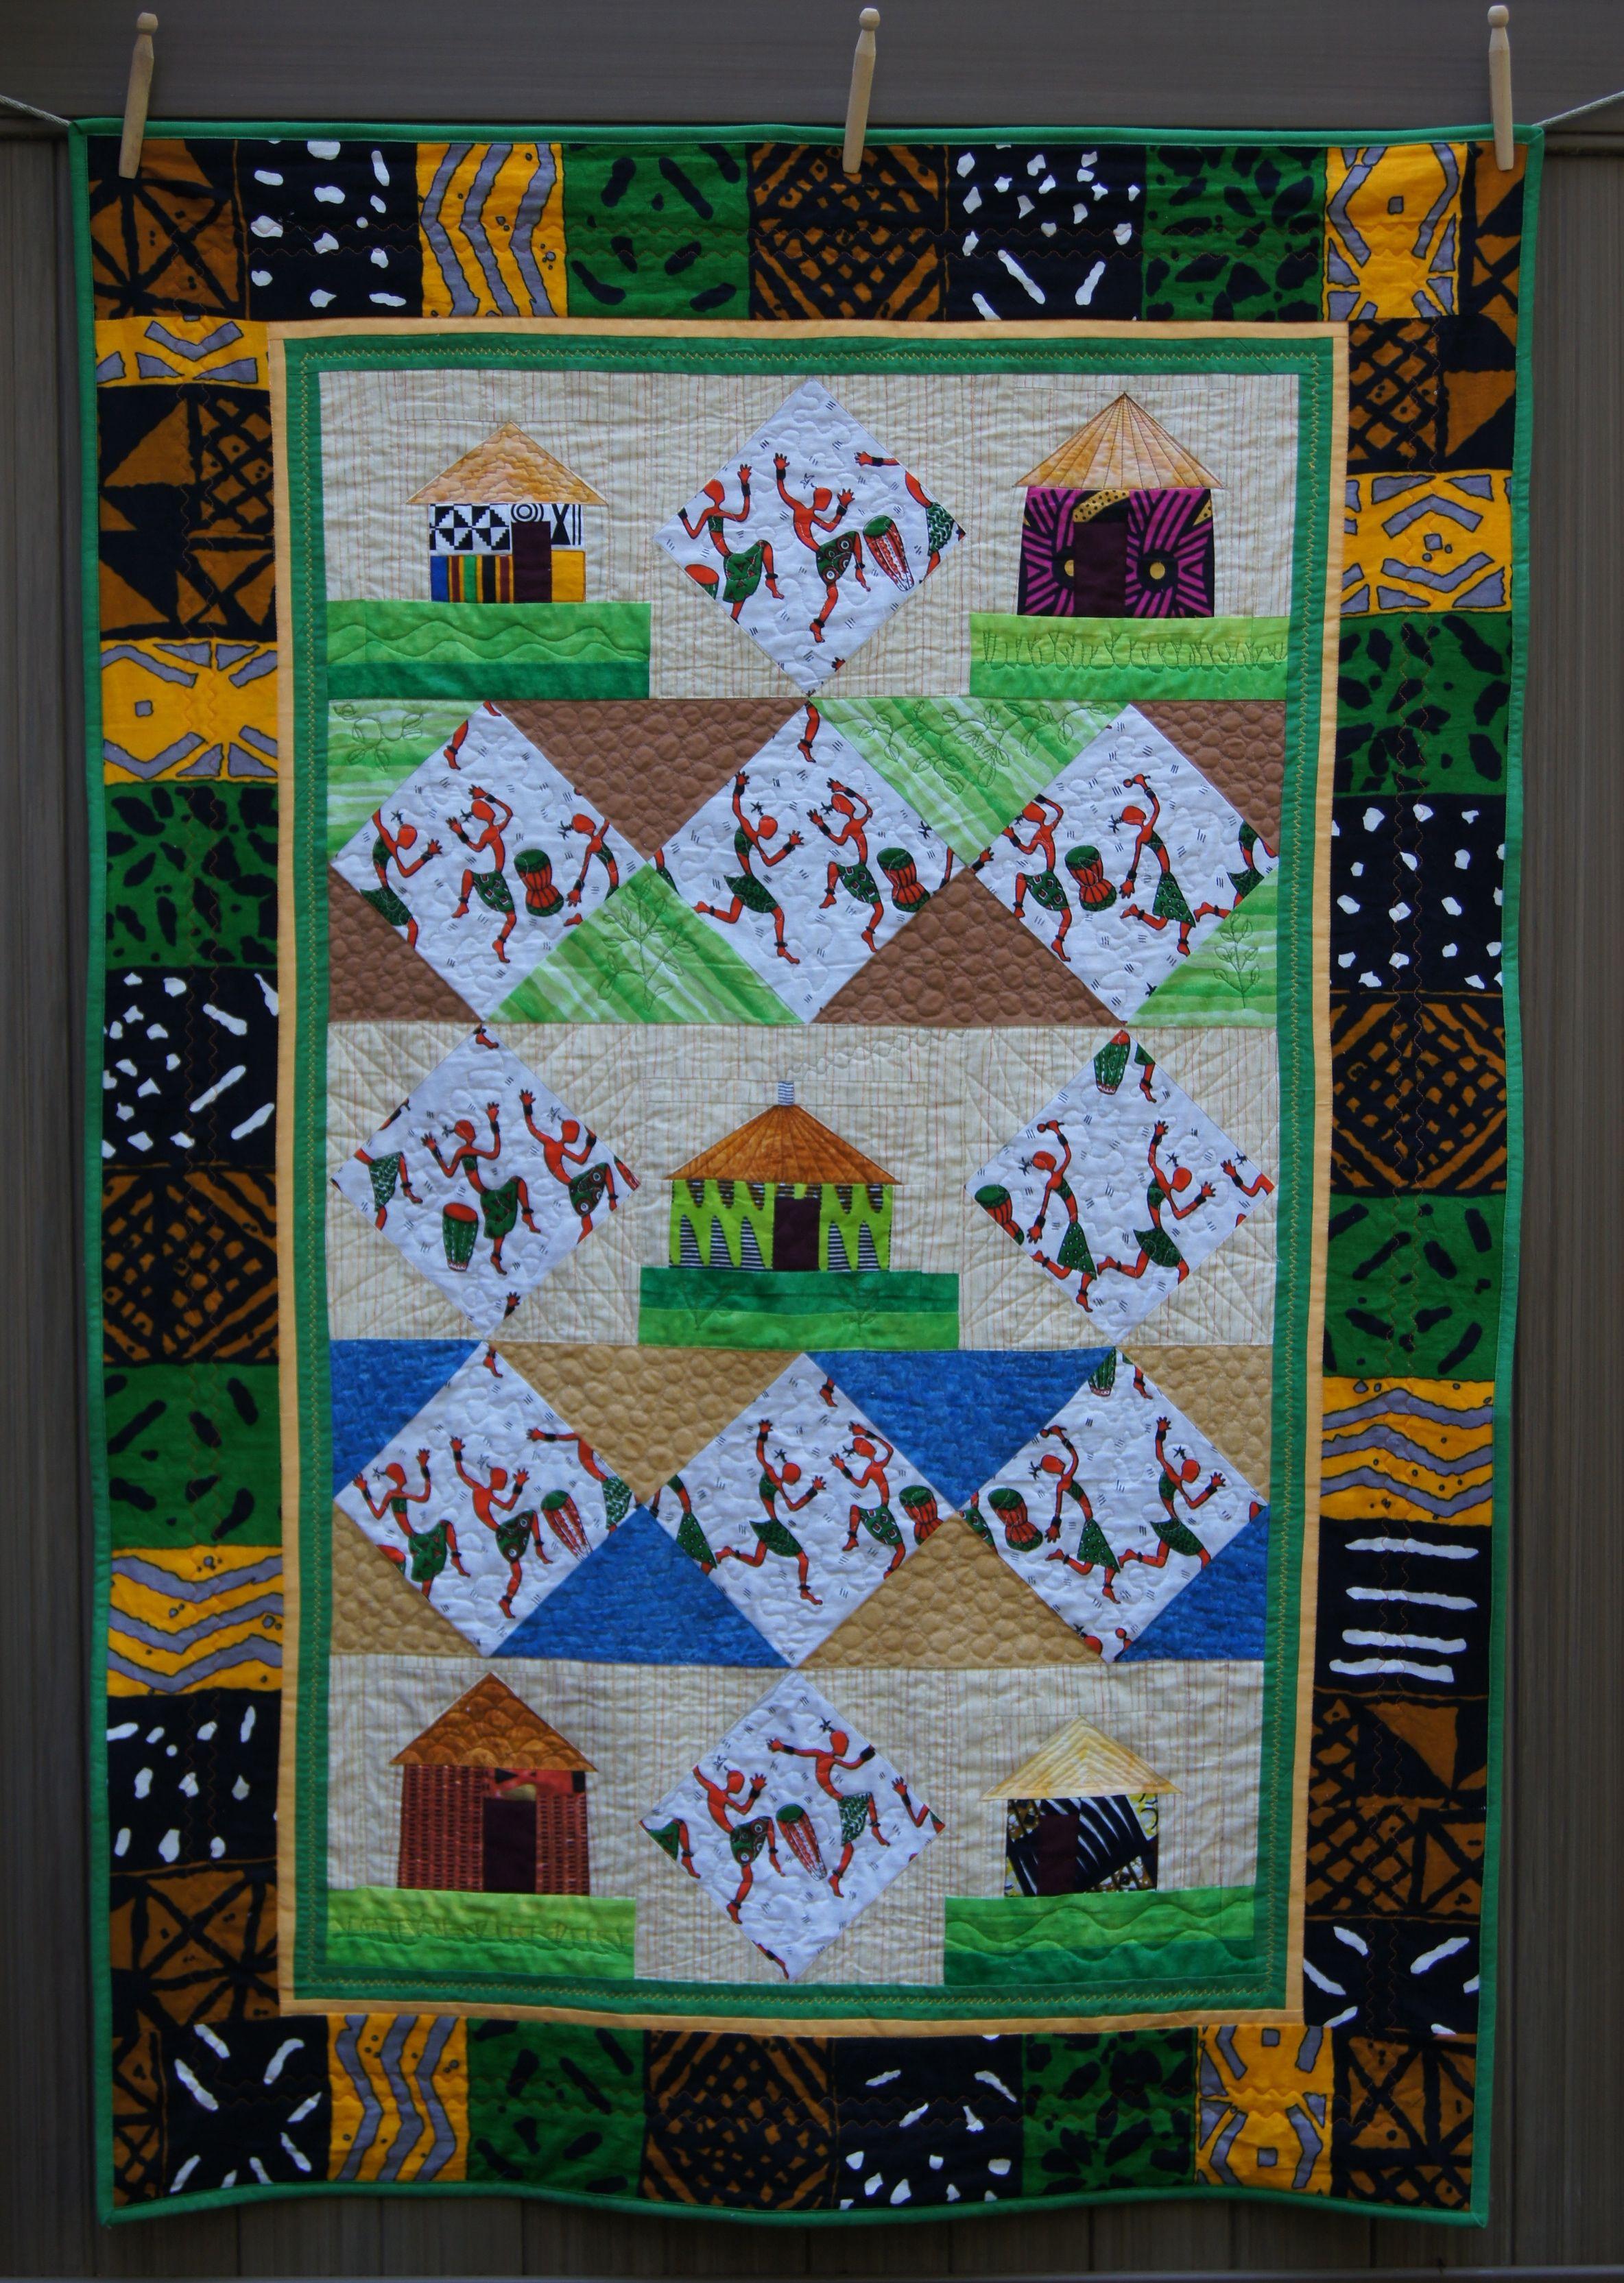 Quilt African Village with Dancers 9-14.jpg